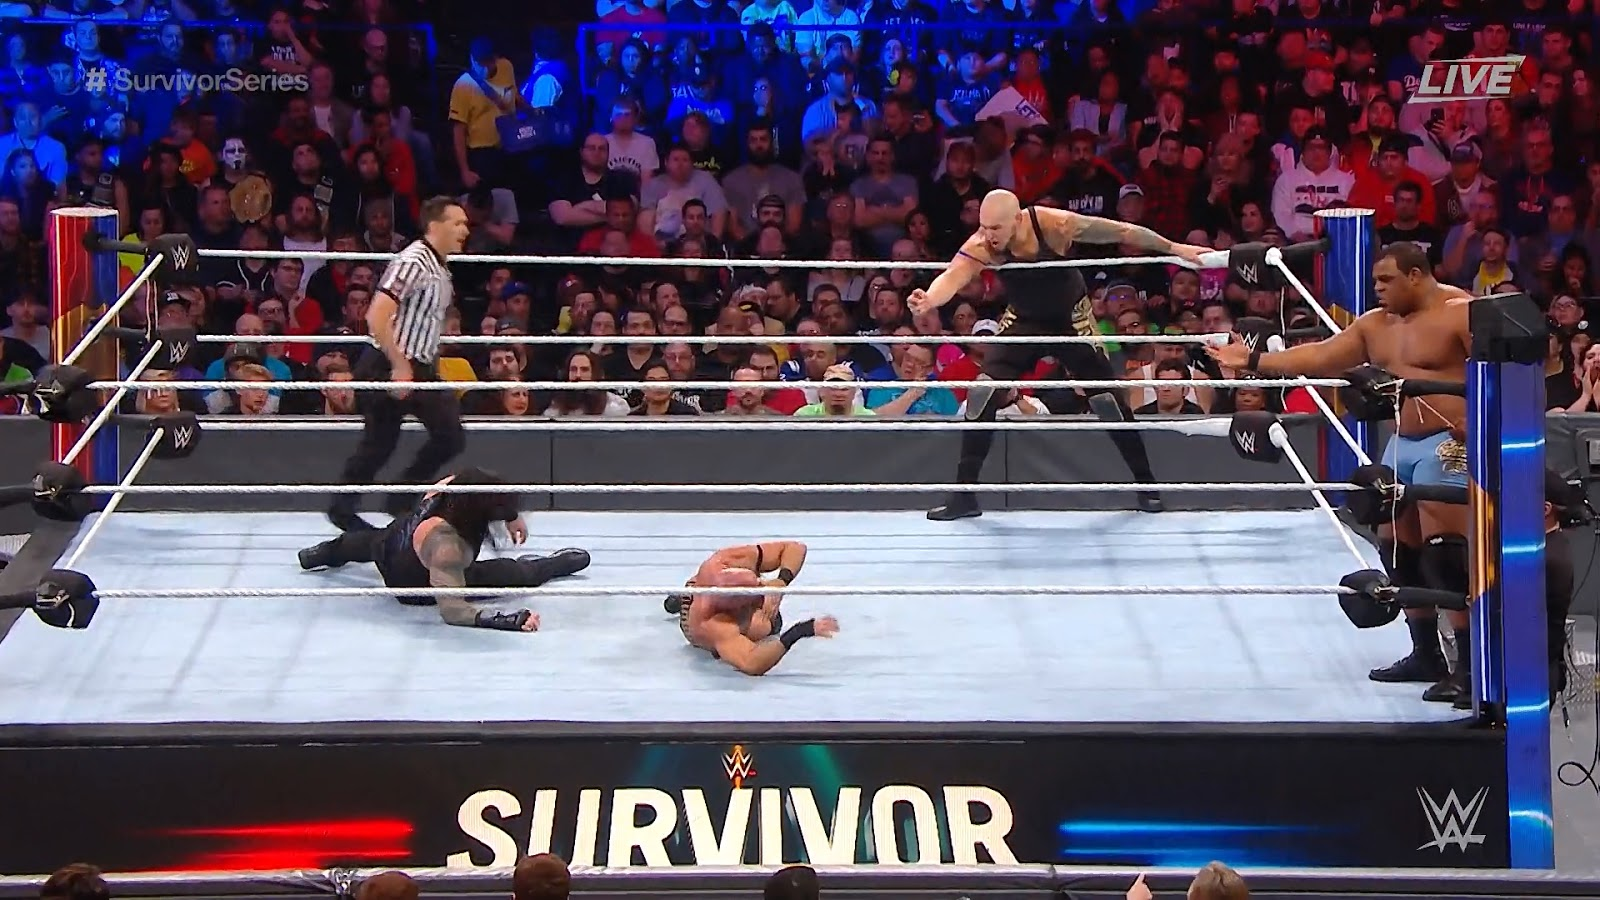 WWE+Survivor+Series+%282019%29+FULL+HD+1080p+Latino+-+Descargatepelis.com.mkv_snapshot_02.18.57.315.jpg (1600×900)